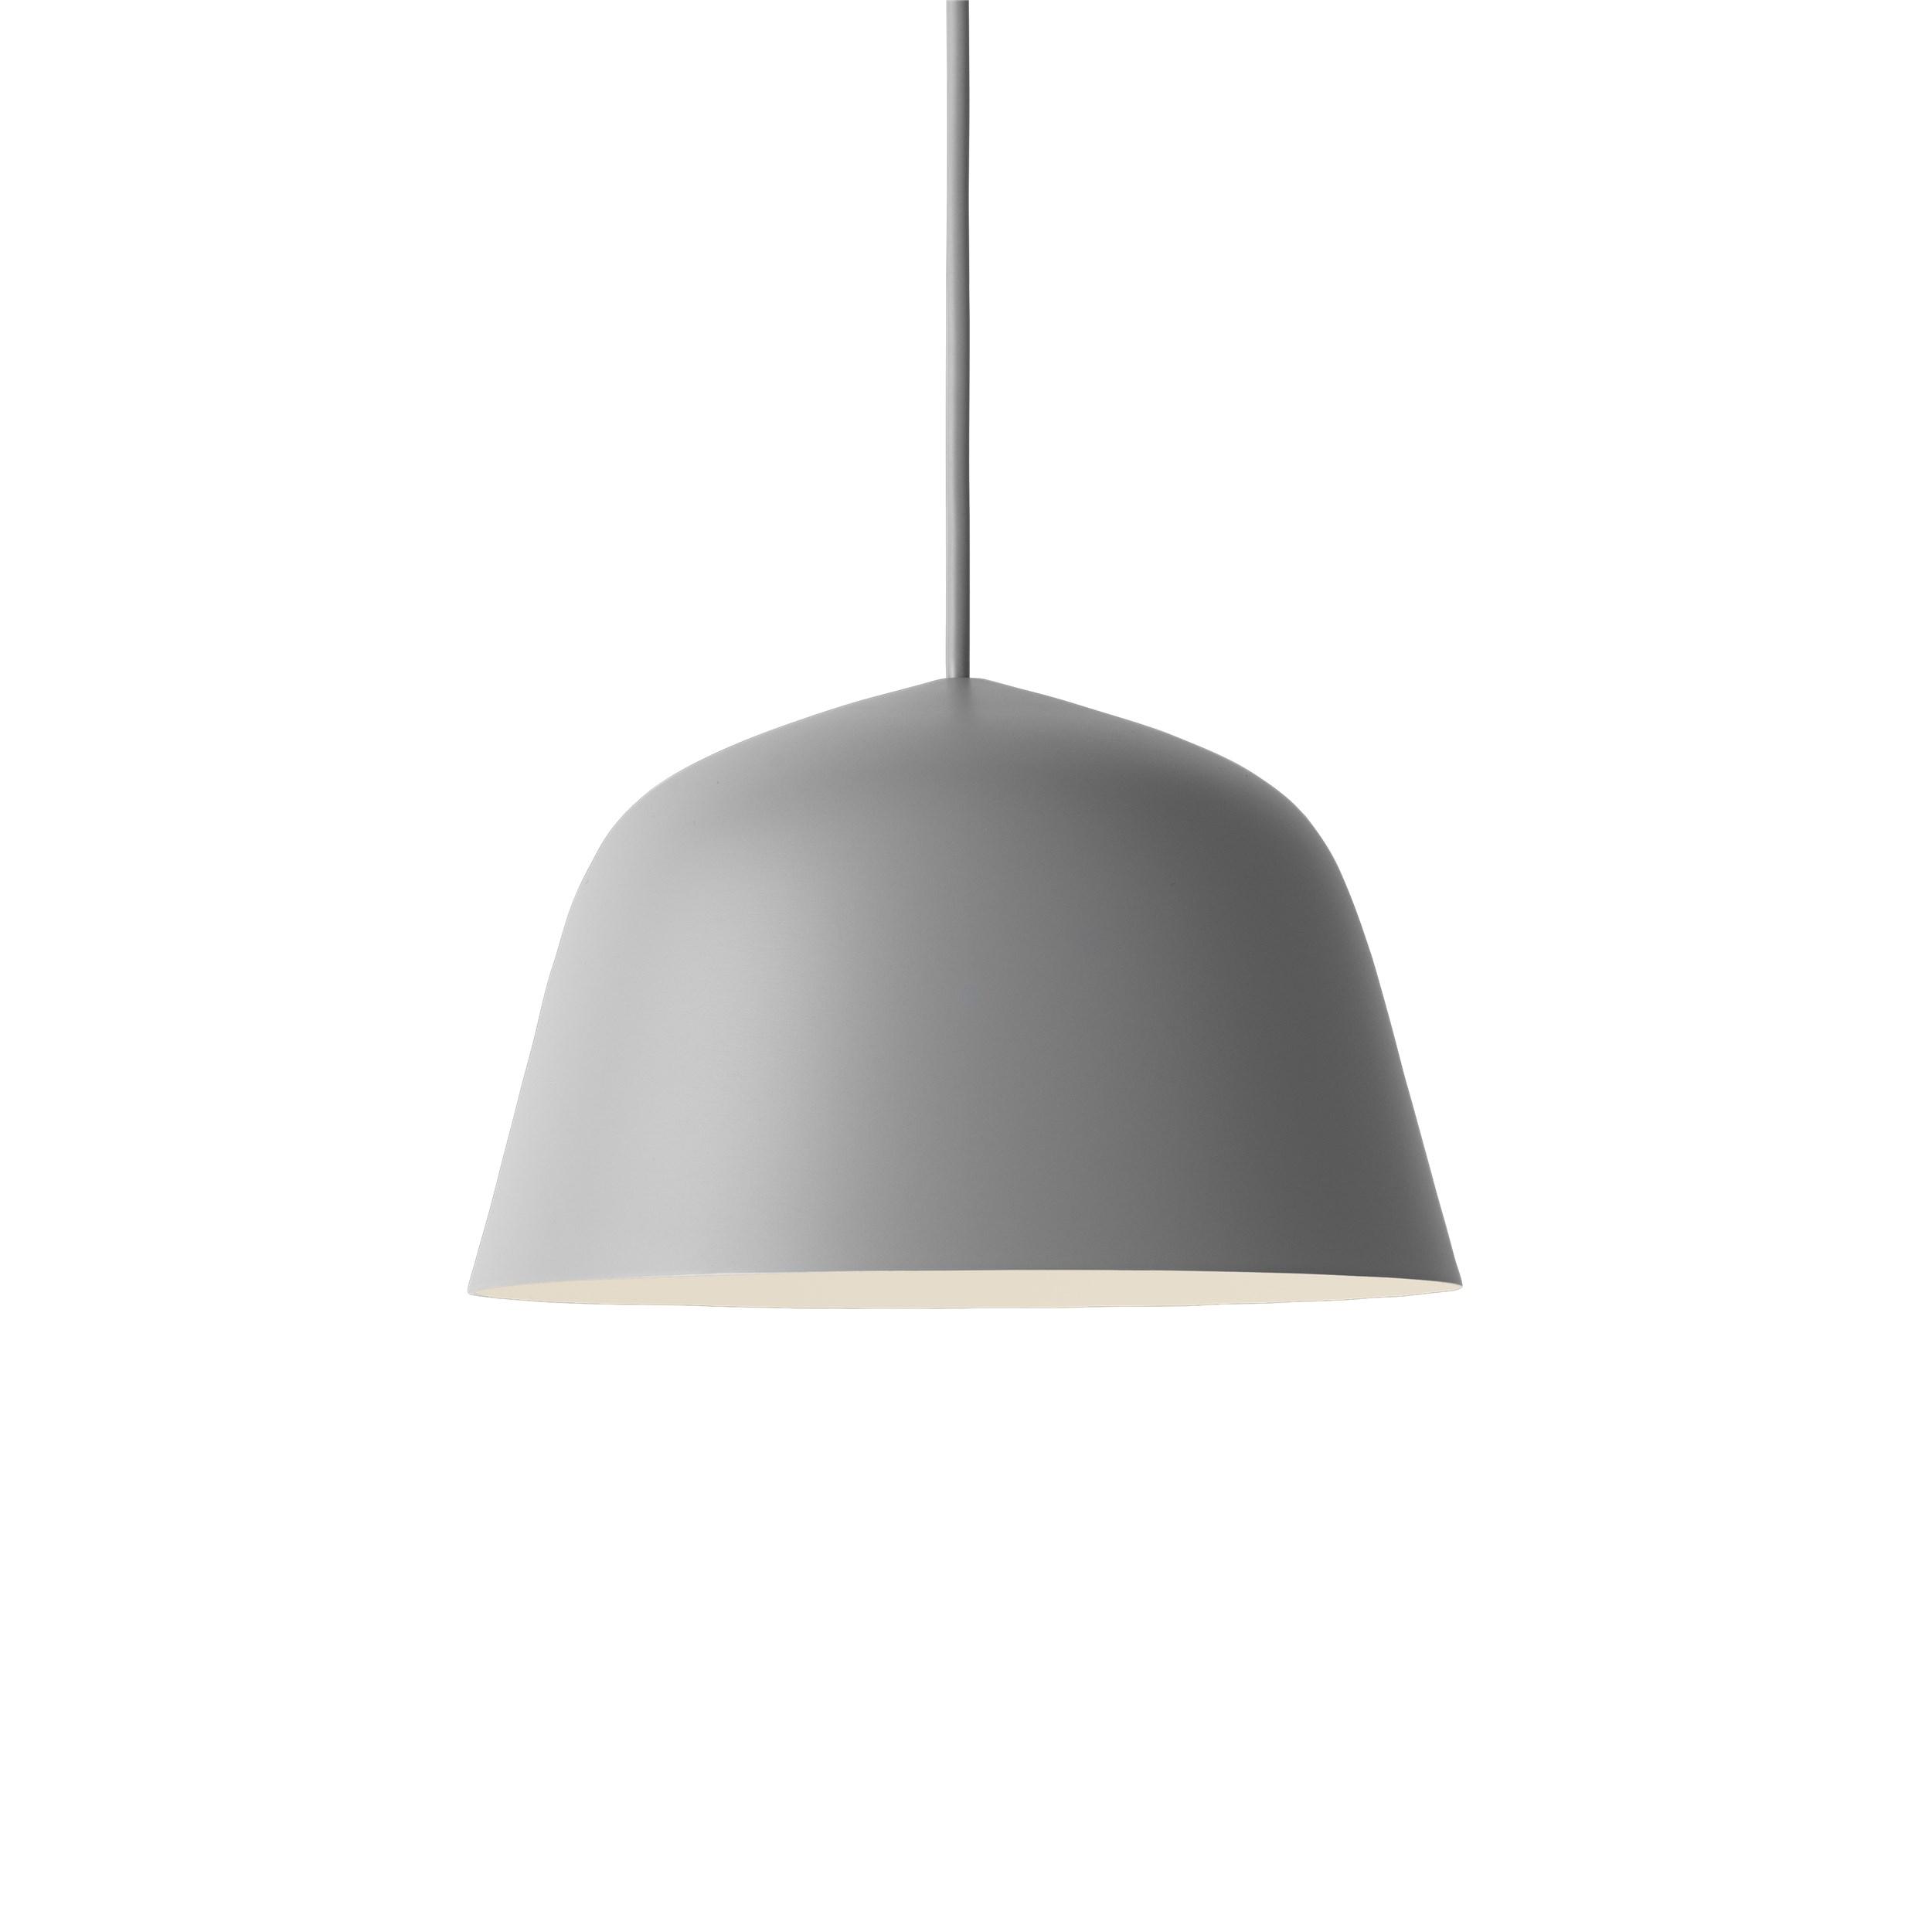 Muuto, Ambit lamp 25, Grey